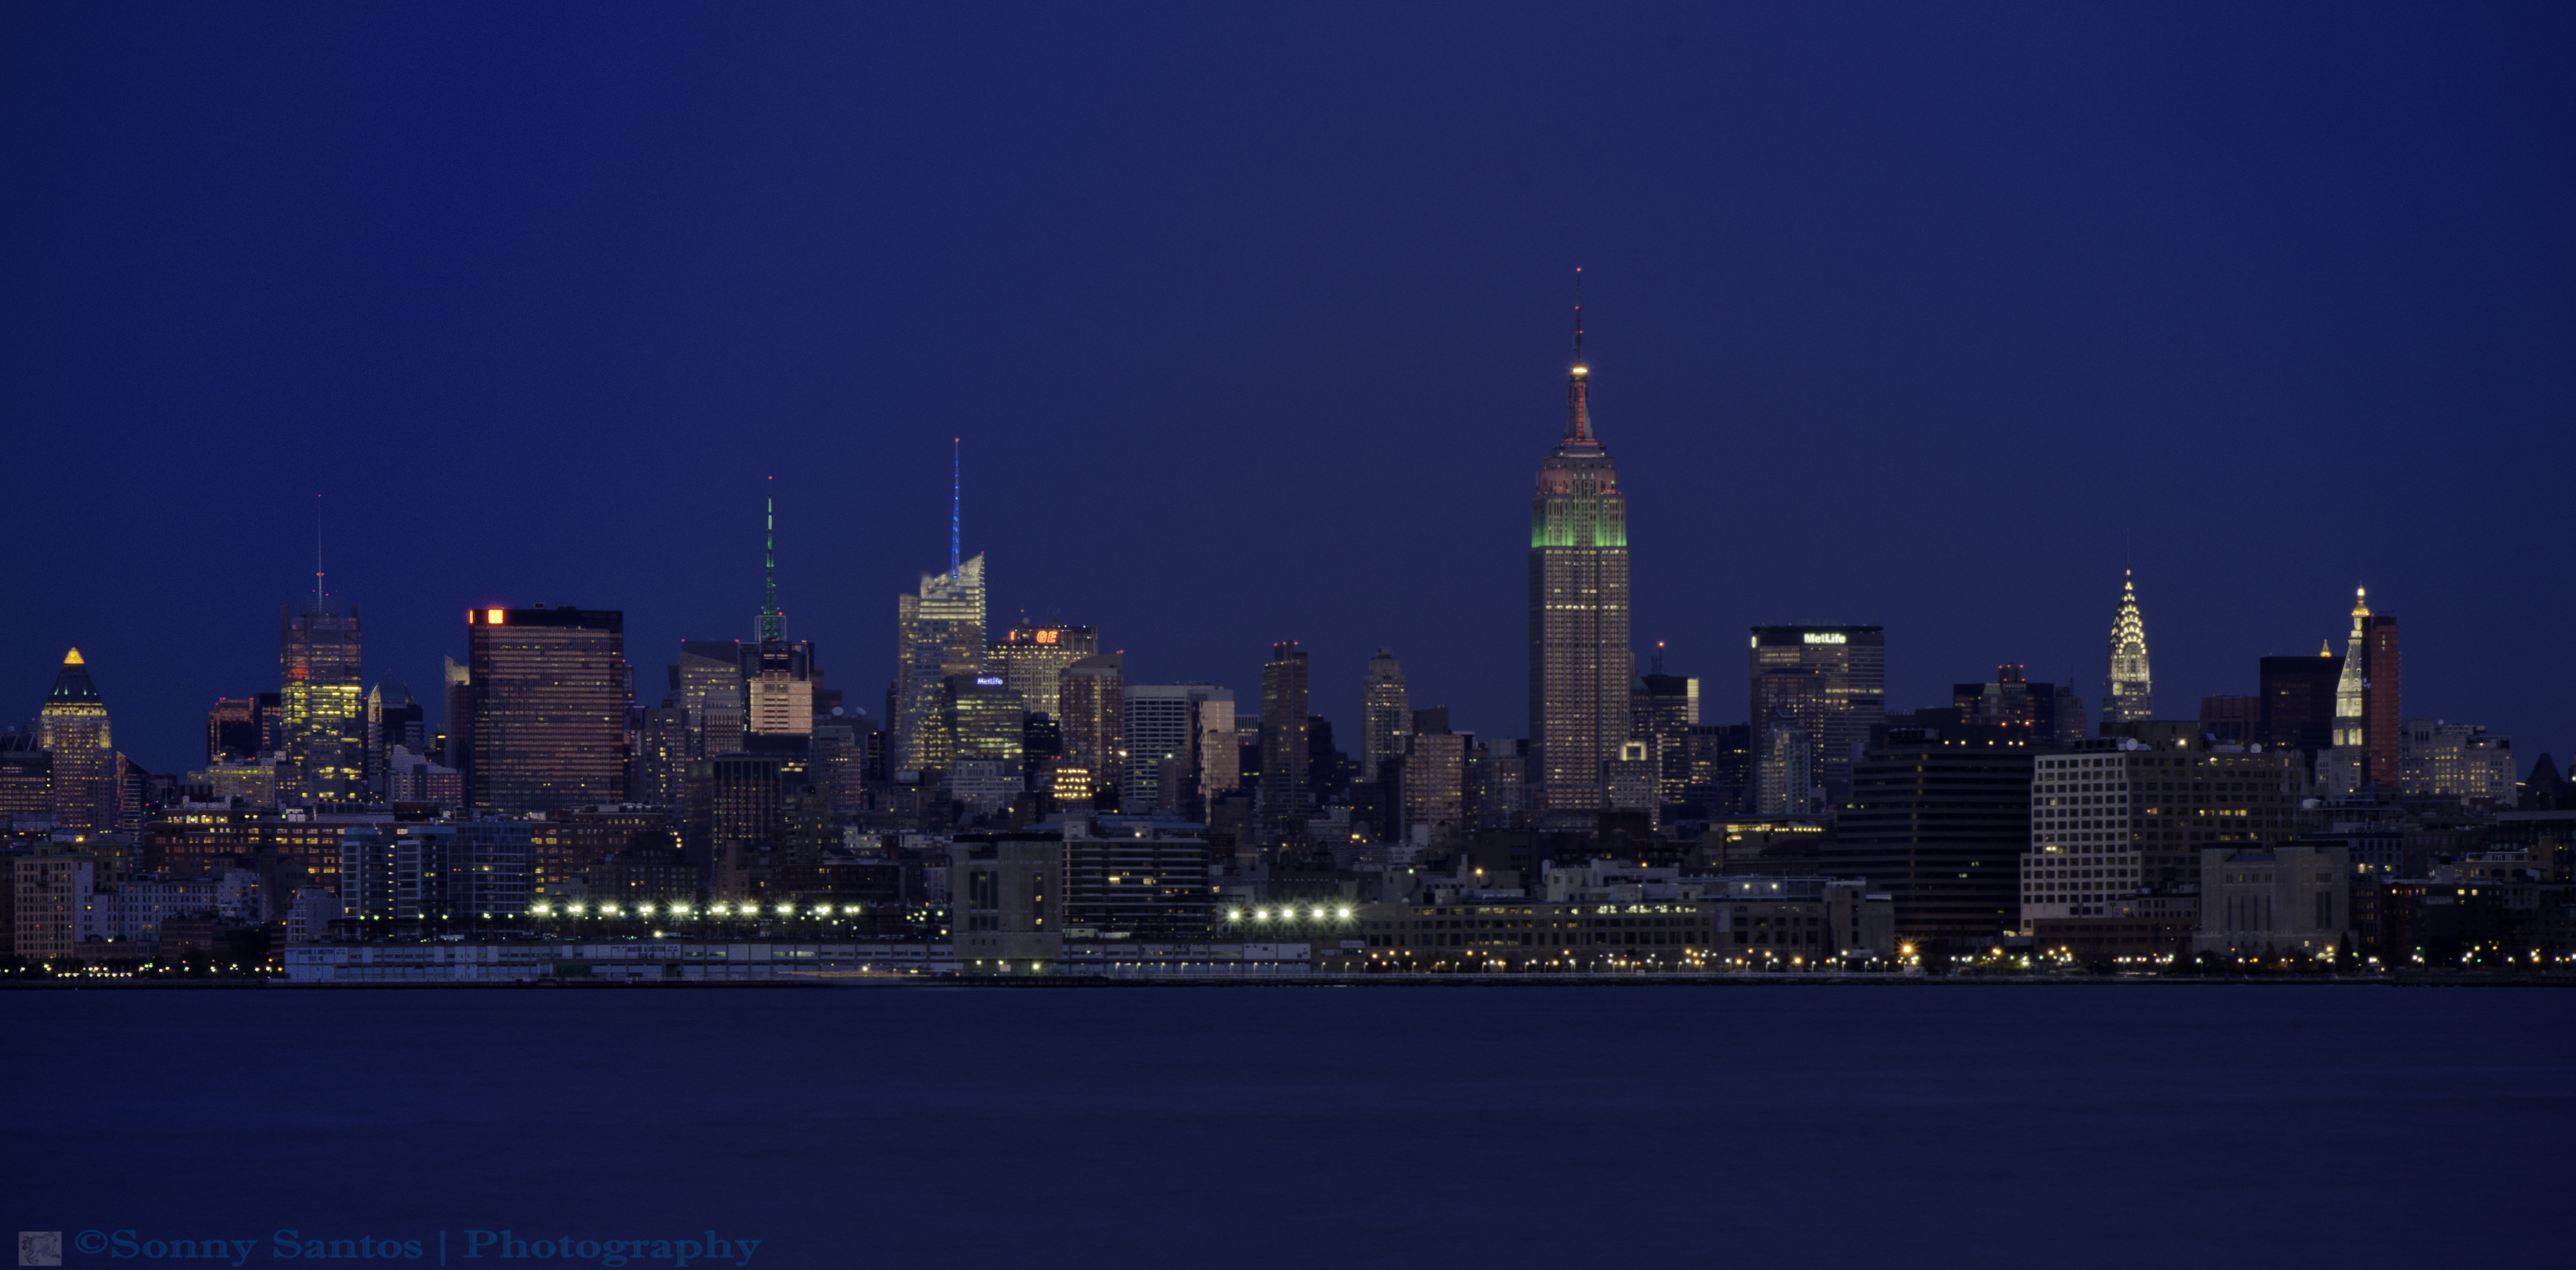 New York City Skyline At Night By Jayars On DeviantArt